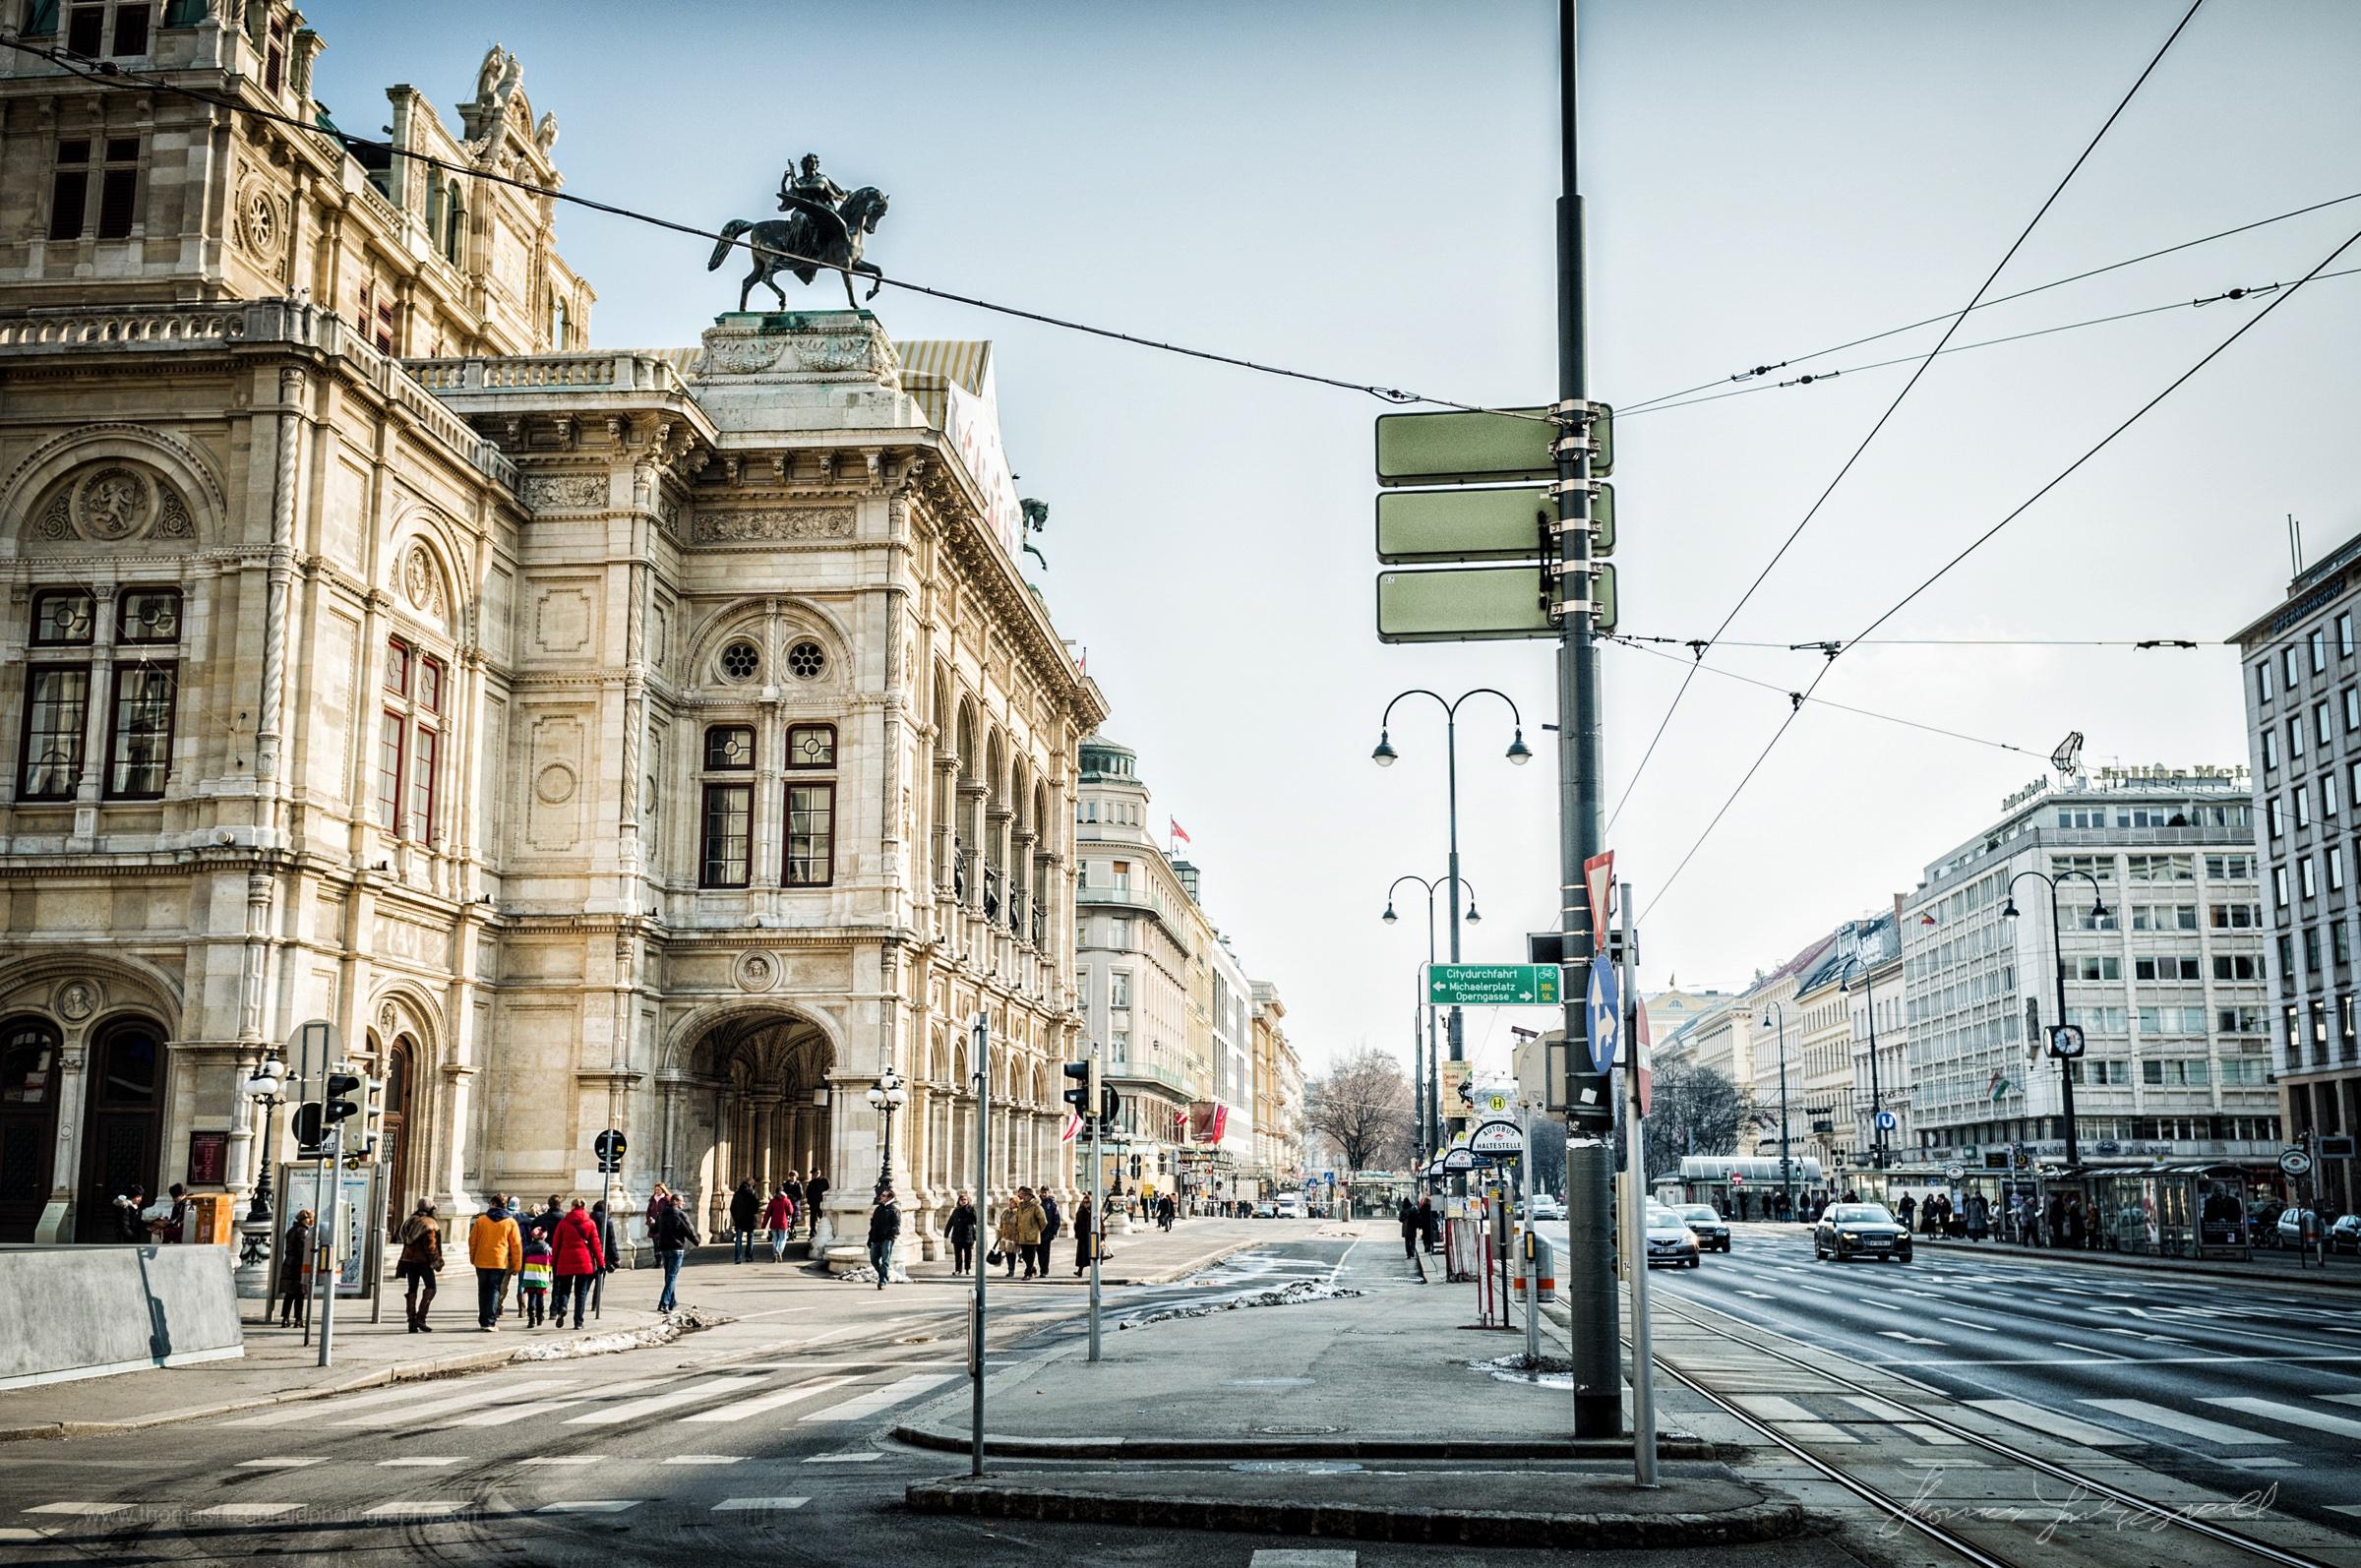 Street outside the Opera House, Vienna, Fujifilm X100